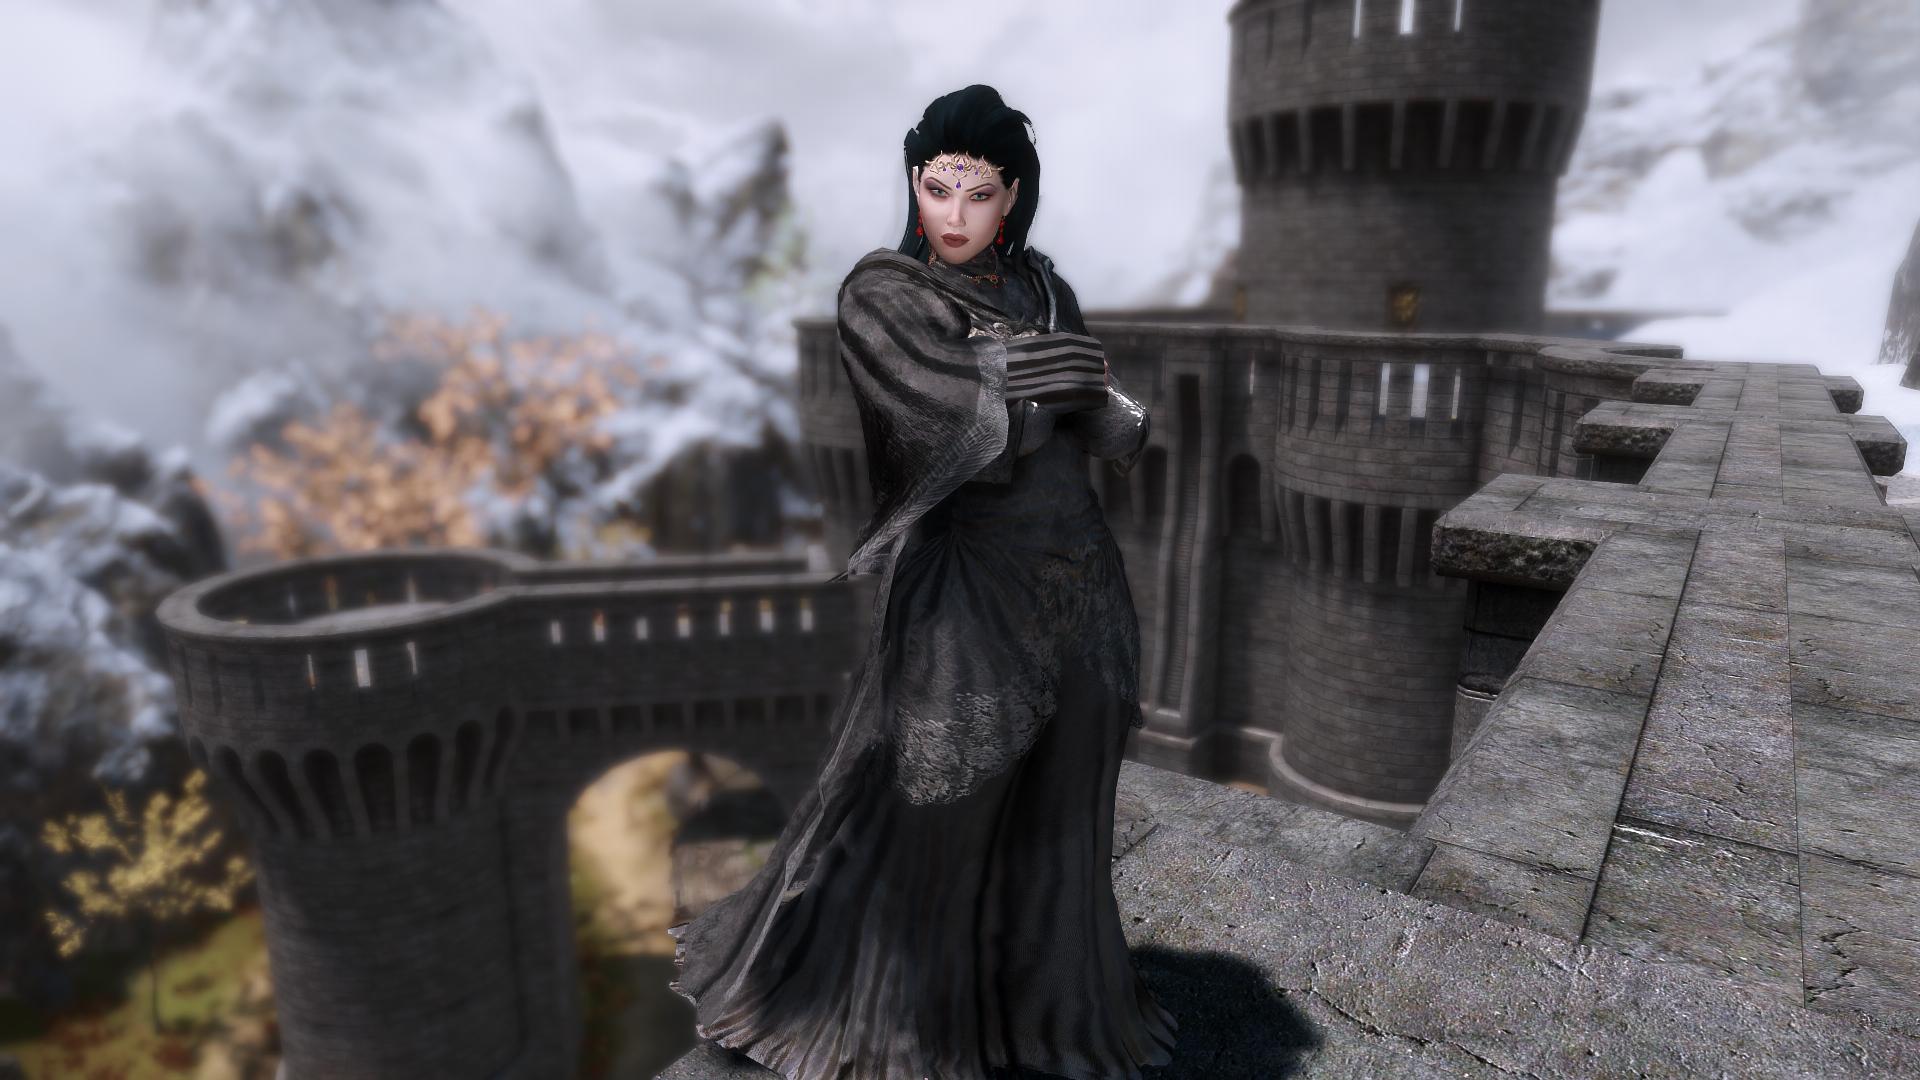 enb2020_1_17_05_30_40.png - Elder Scrolls 5: Skyrim, the